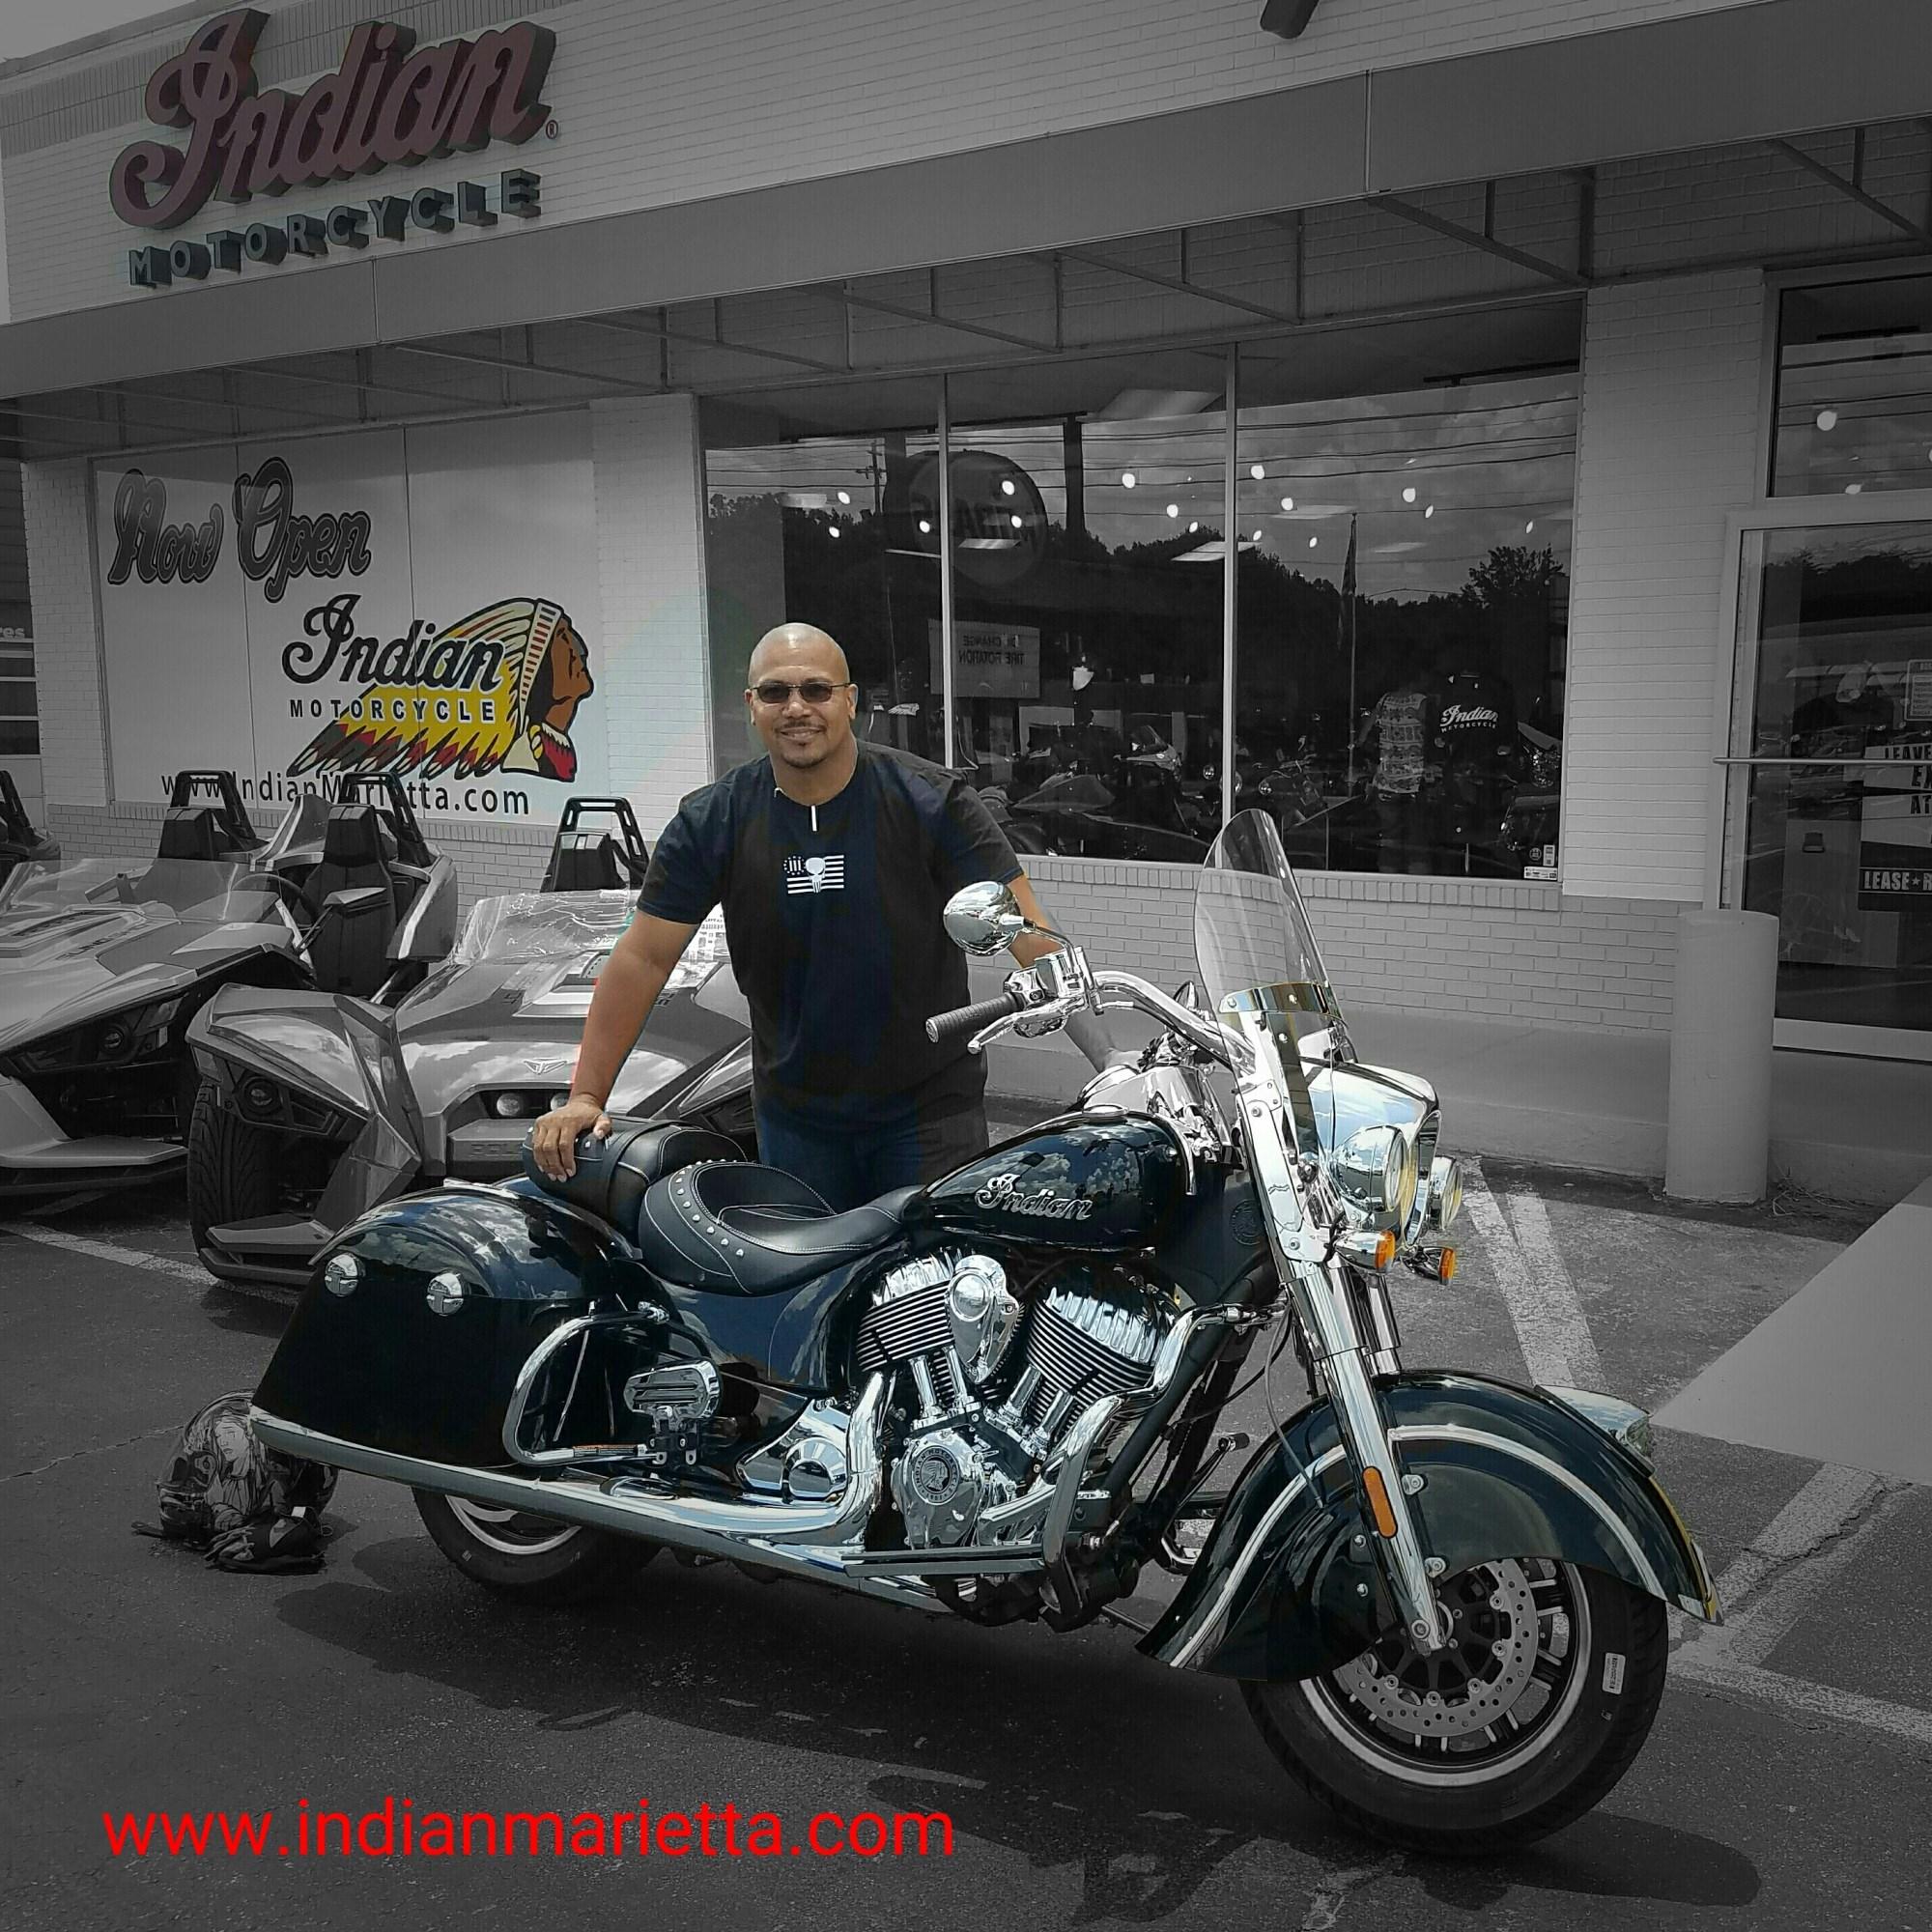 Slingshot For Sale Marietta Ga >> Marietta GA Indian Motorcycle of Marietta Indian Dealer Reviews | 2016 Indian SPRINGFIELD